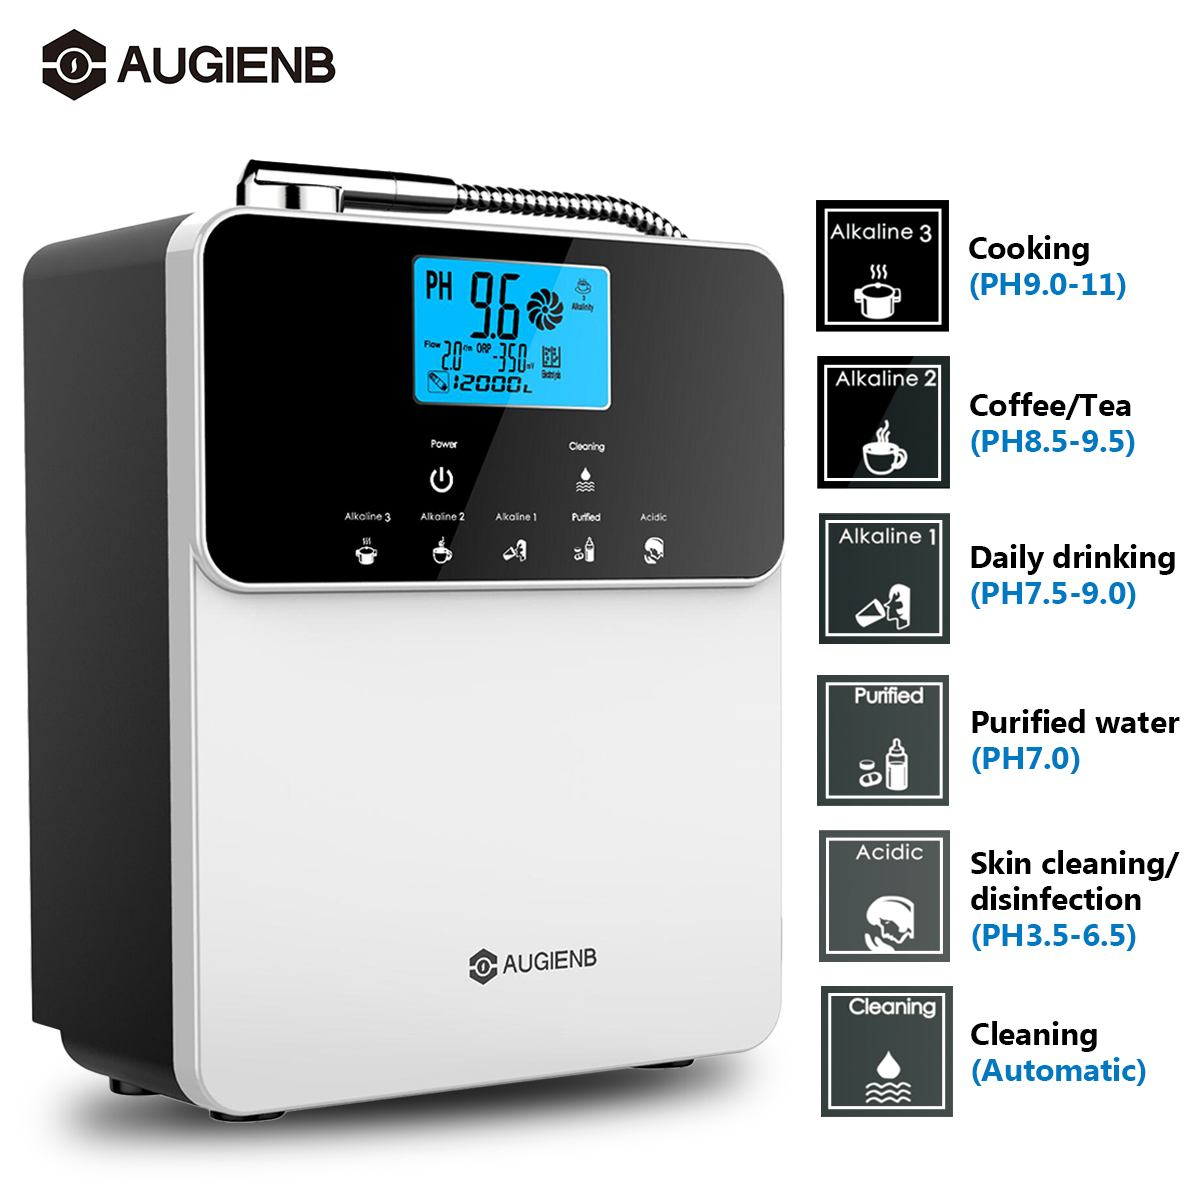 Purificador de ionizador de agua Augienb 12000L máquina PH3.5-11 ácido alcalino ajuste 5 ajustes de modo Auto-limpieza LCD filtro de agua táctil